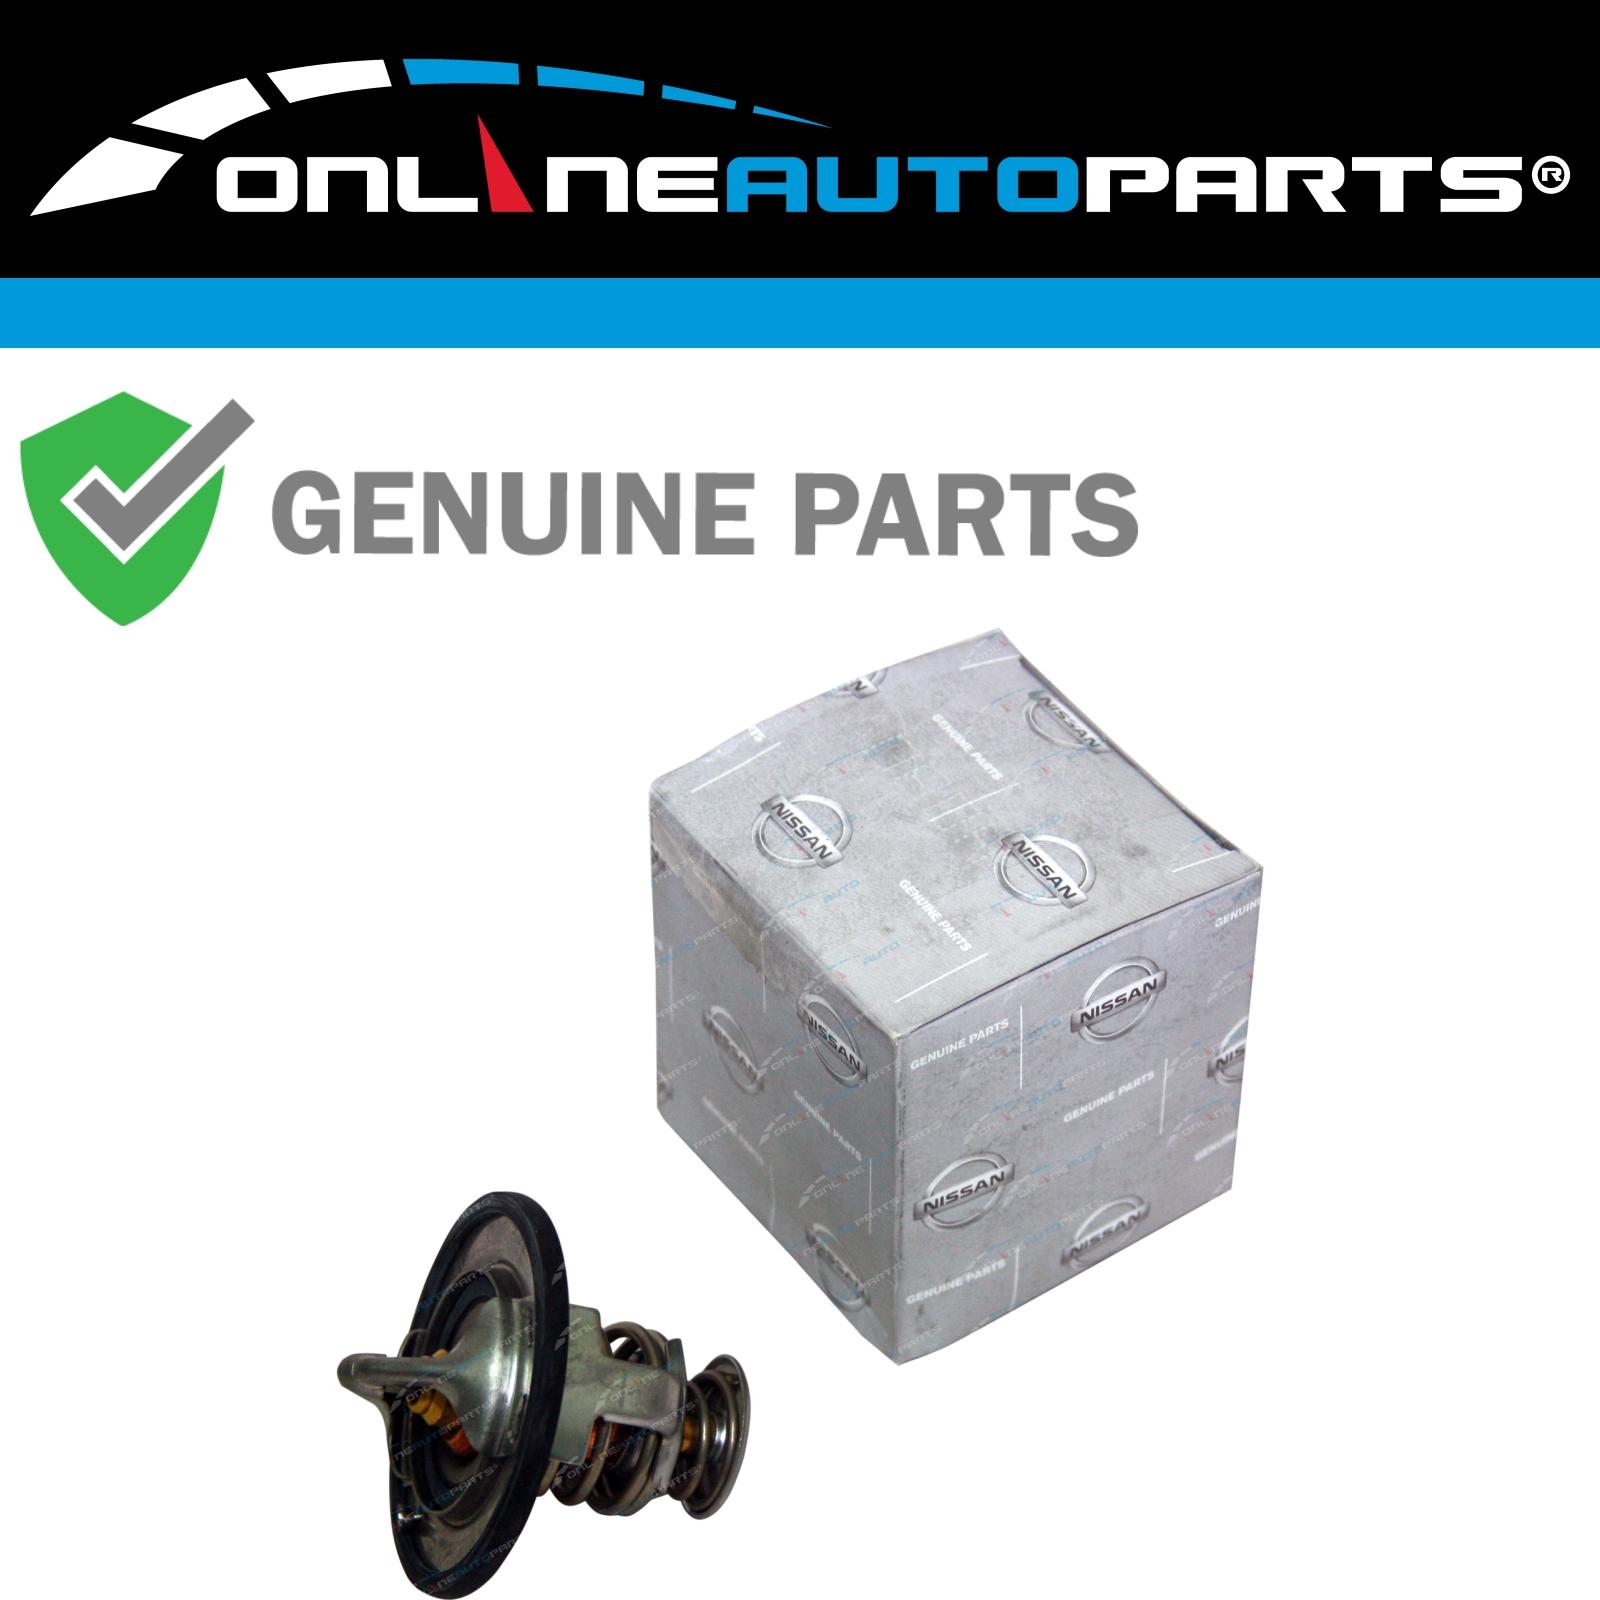 Thermostat Genuine Nissan Navara D22 D40 02 14 4cyl Yd25ddti 2 5l Diesel Engine Car Truck Thermostats Parts